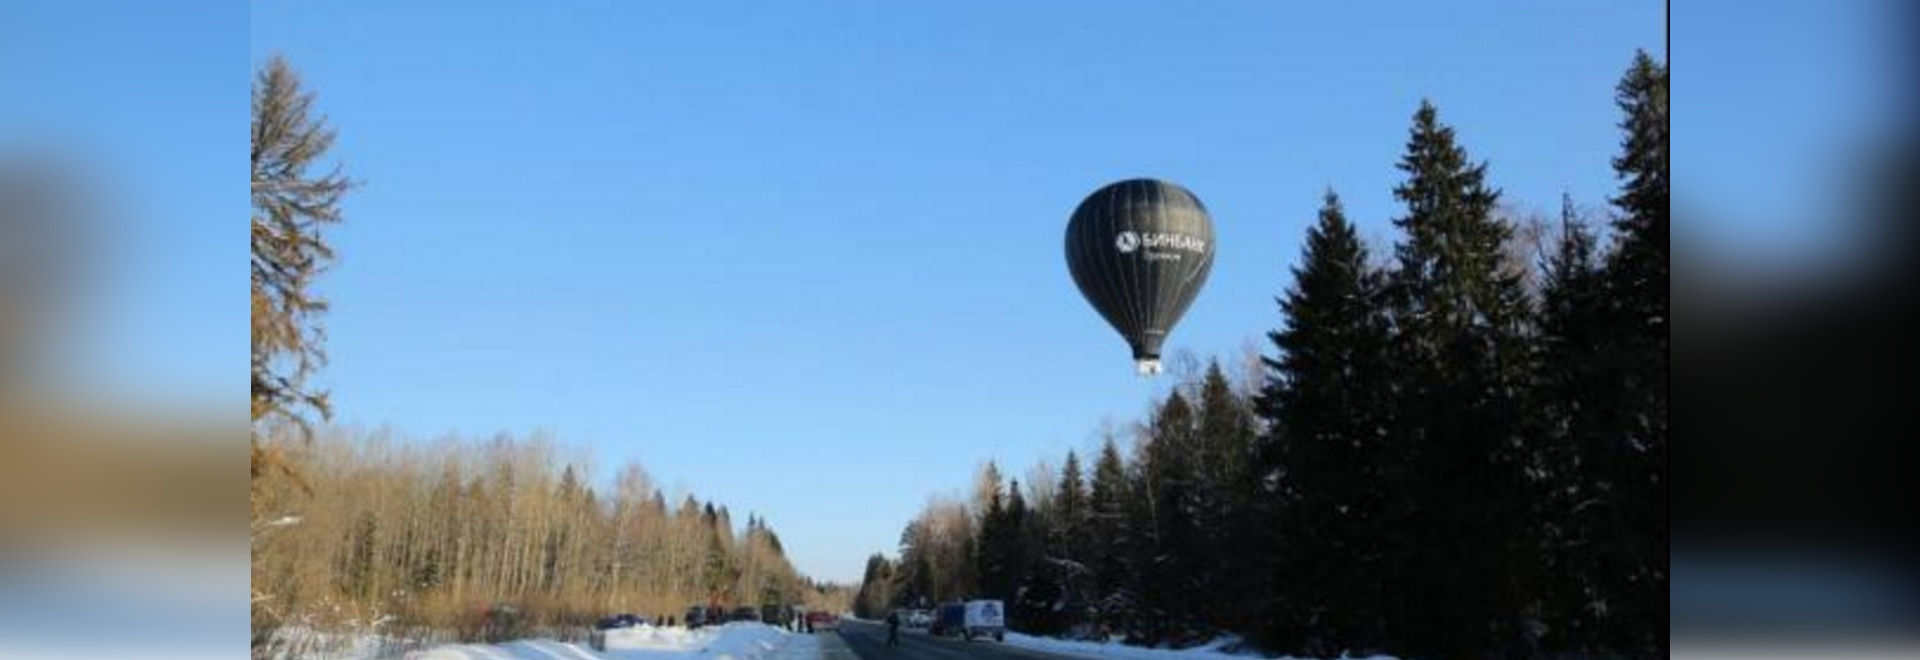 Russian adventurer off to set hot air balloon record